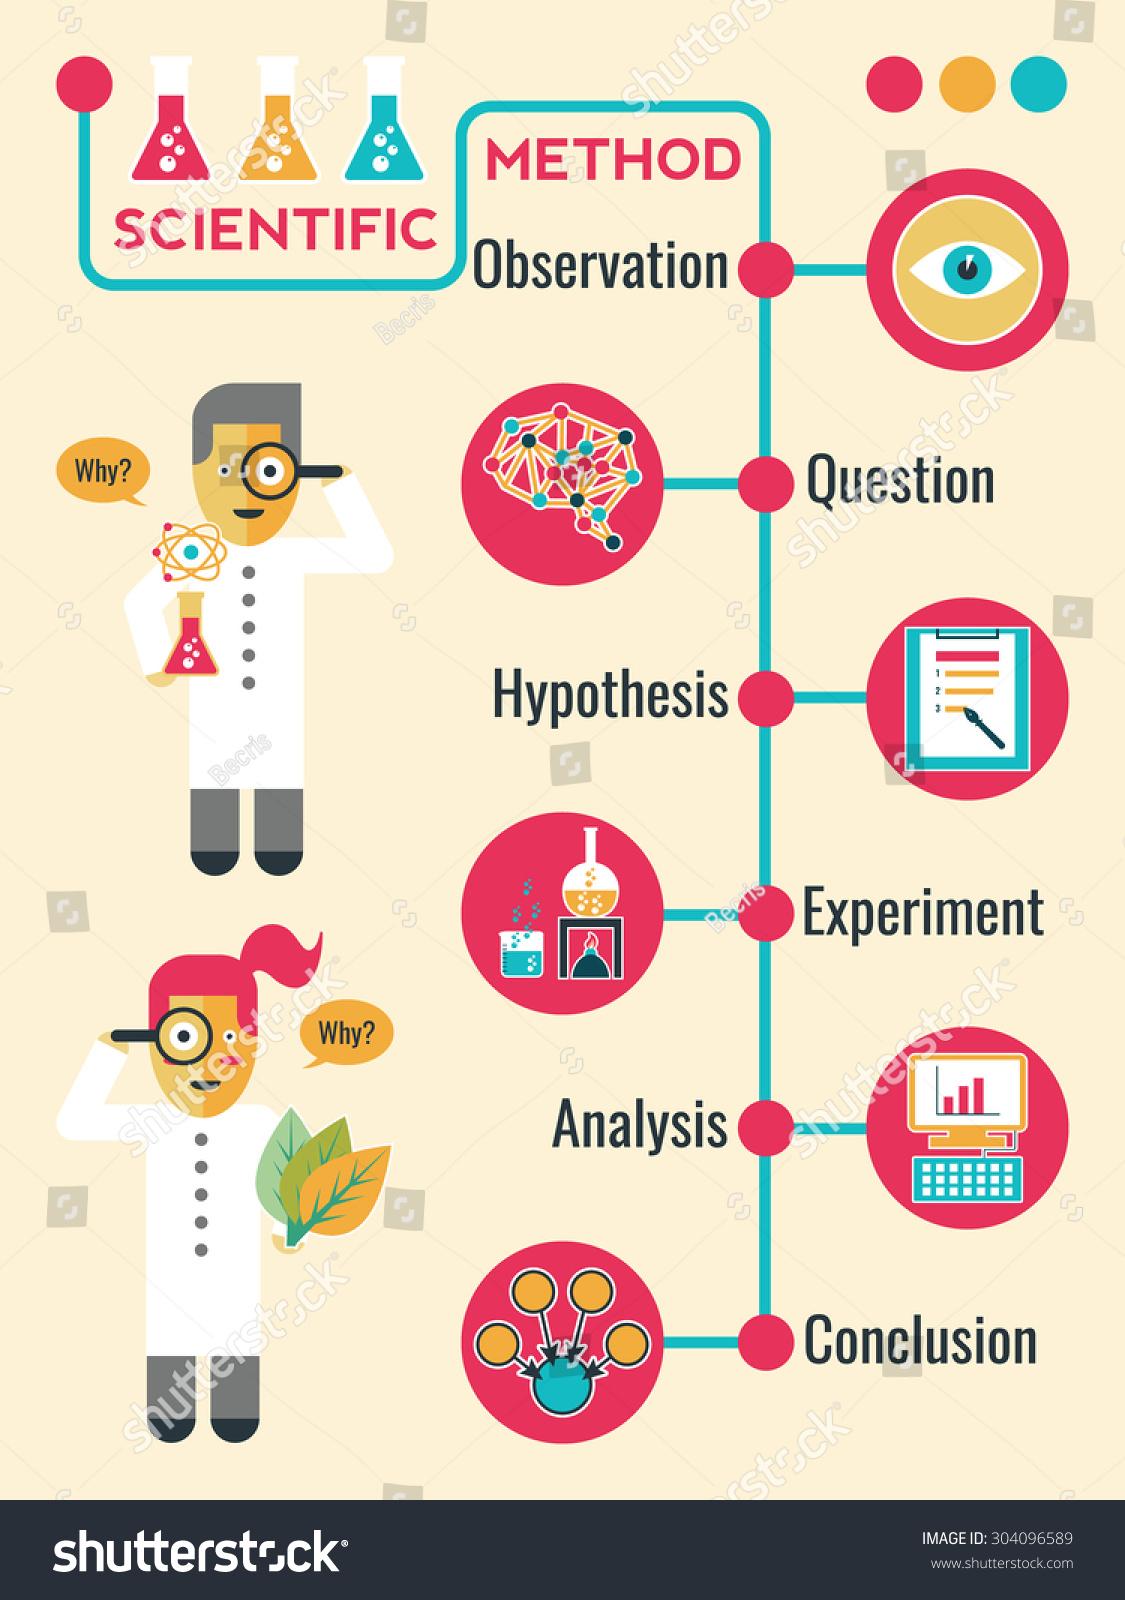 Calendar Method With Illustration : Illustration scientific method infographic timeline chart